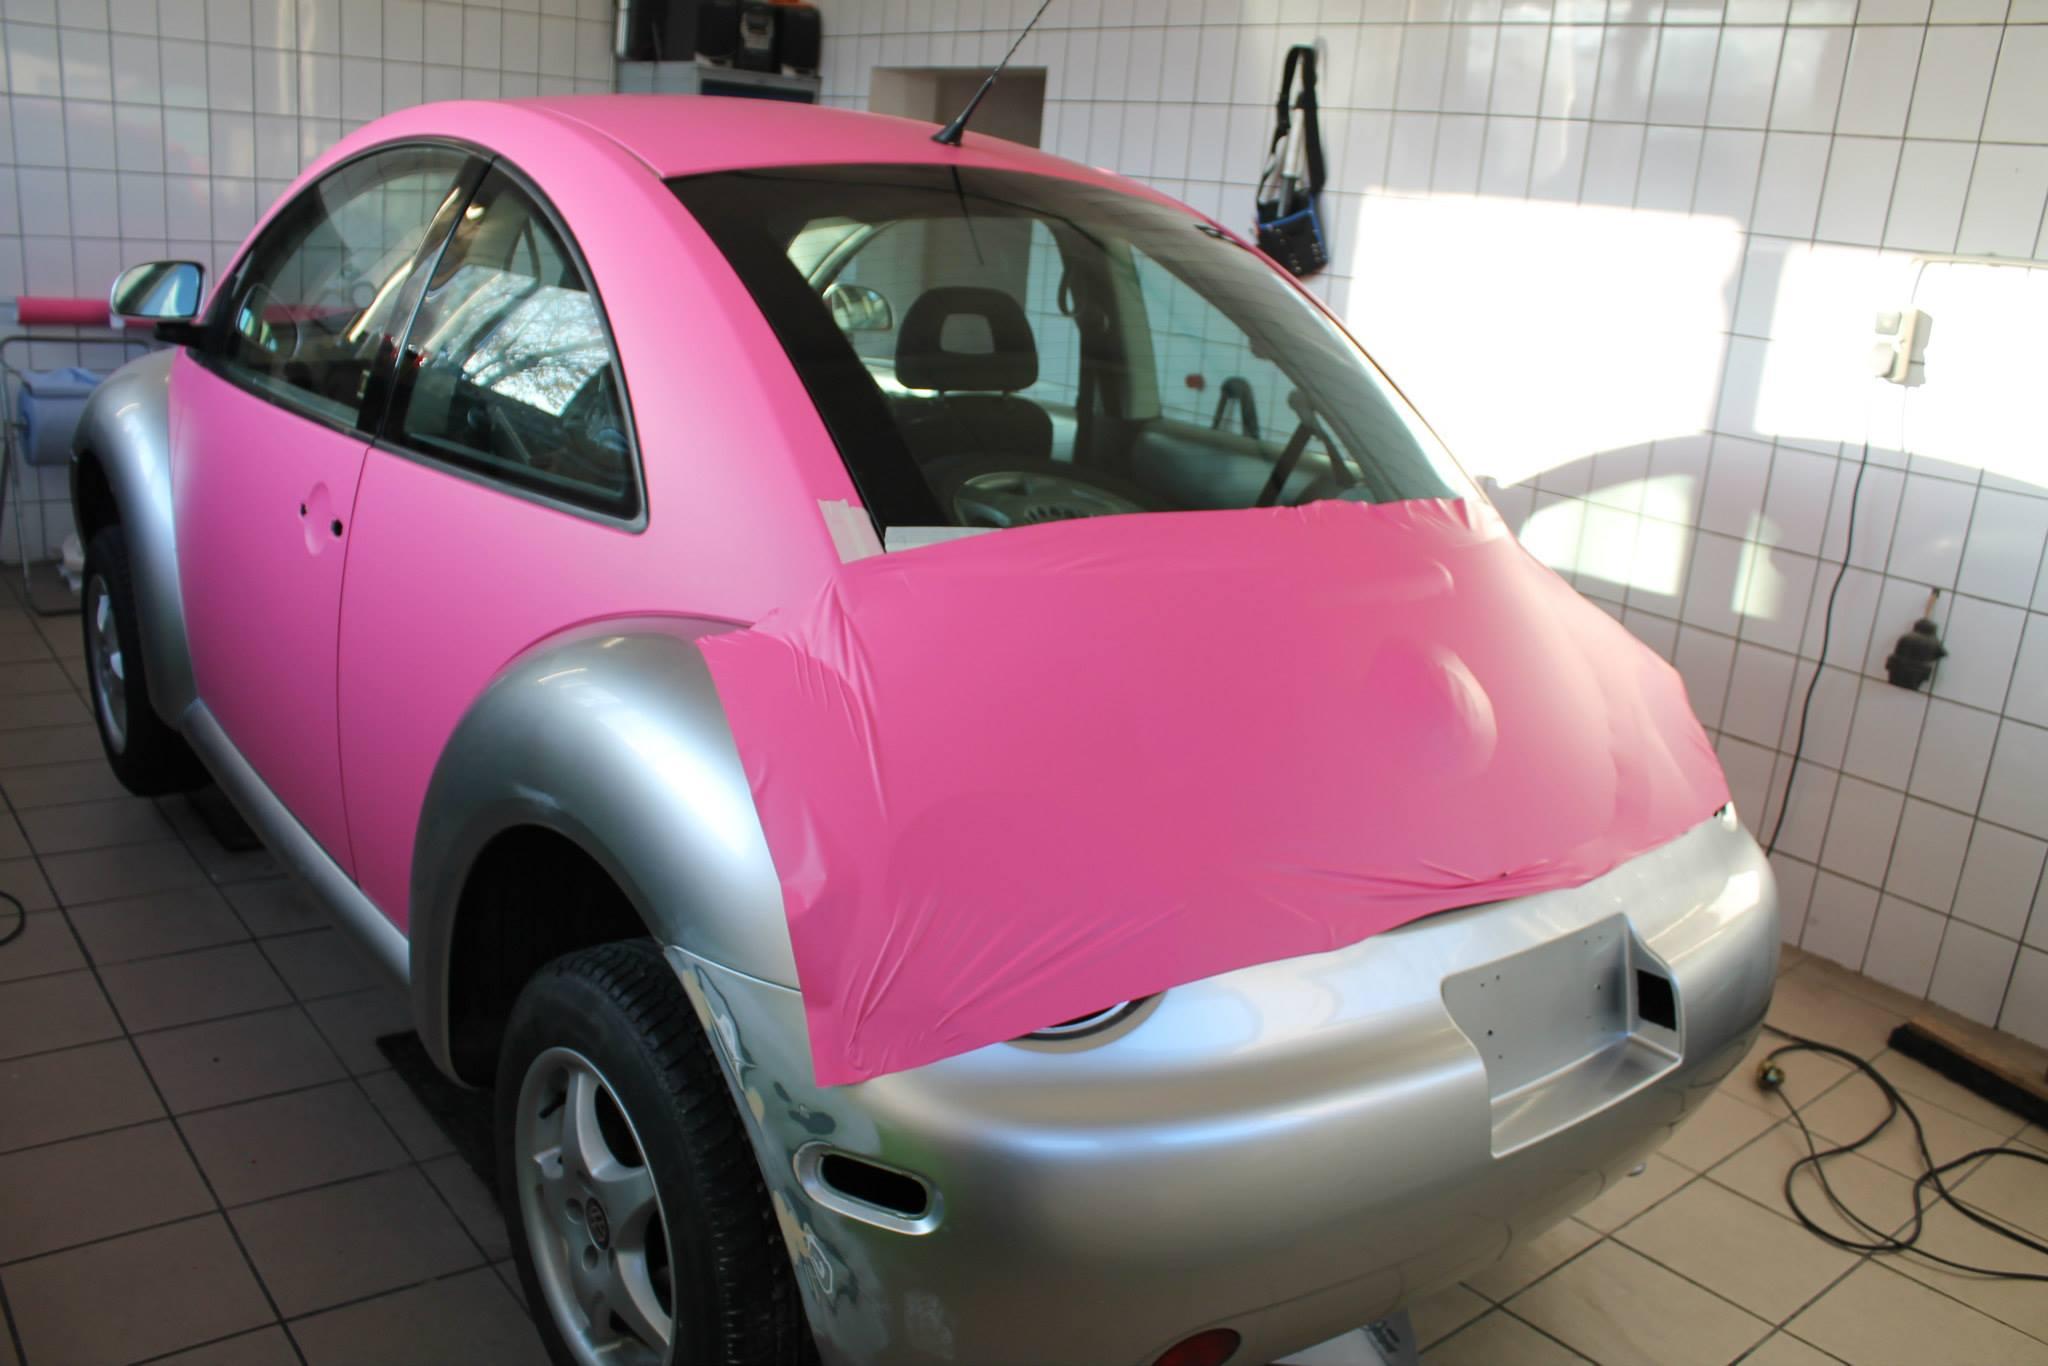 pink driving in vw beetle the gone volkswagen